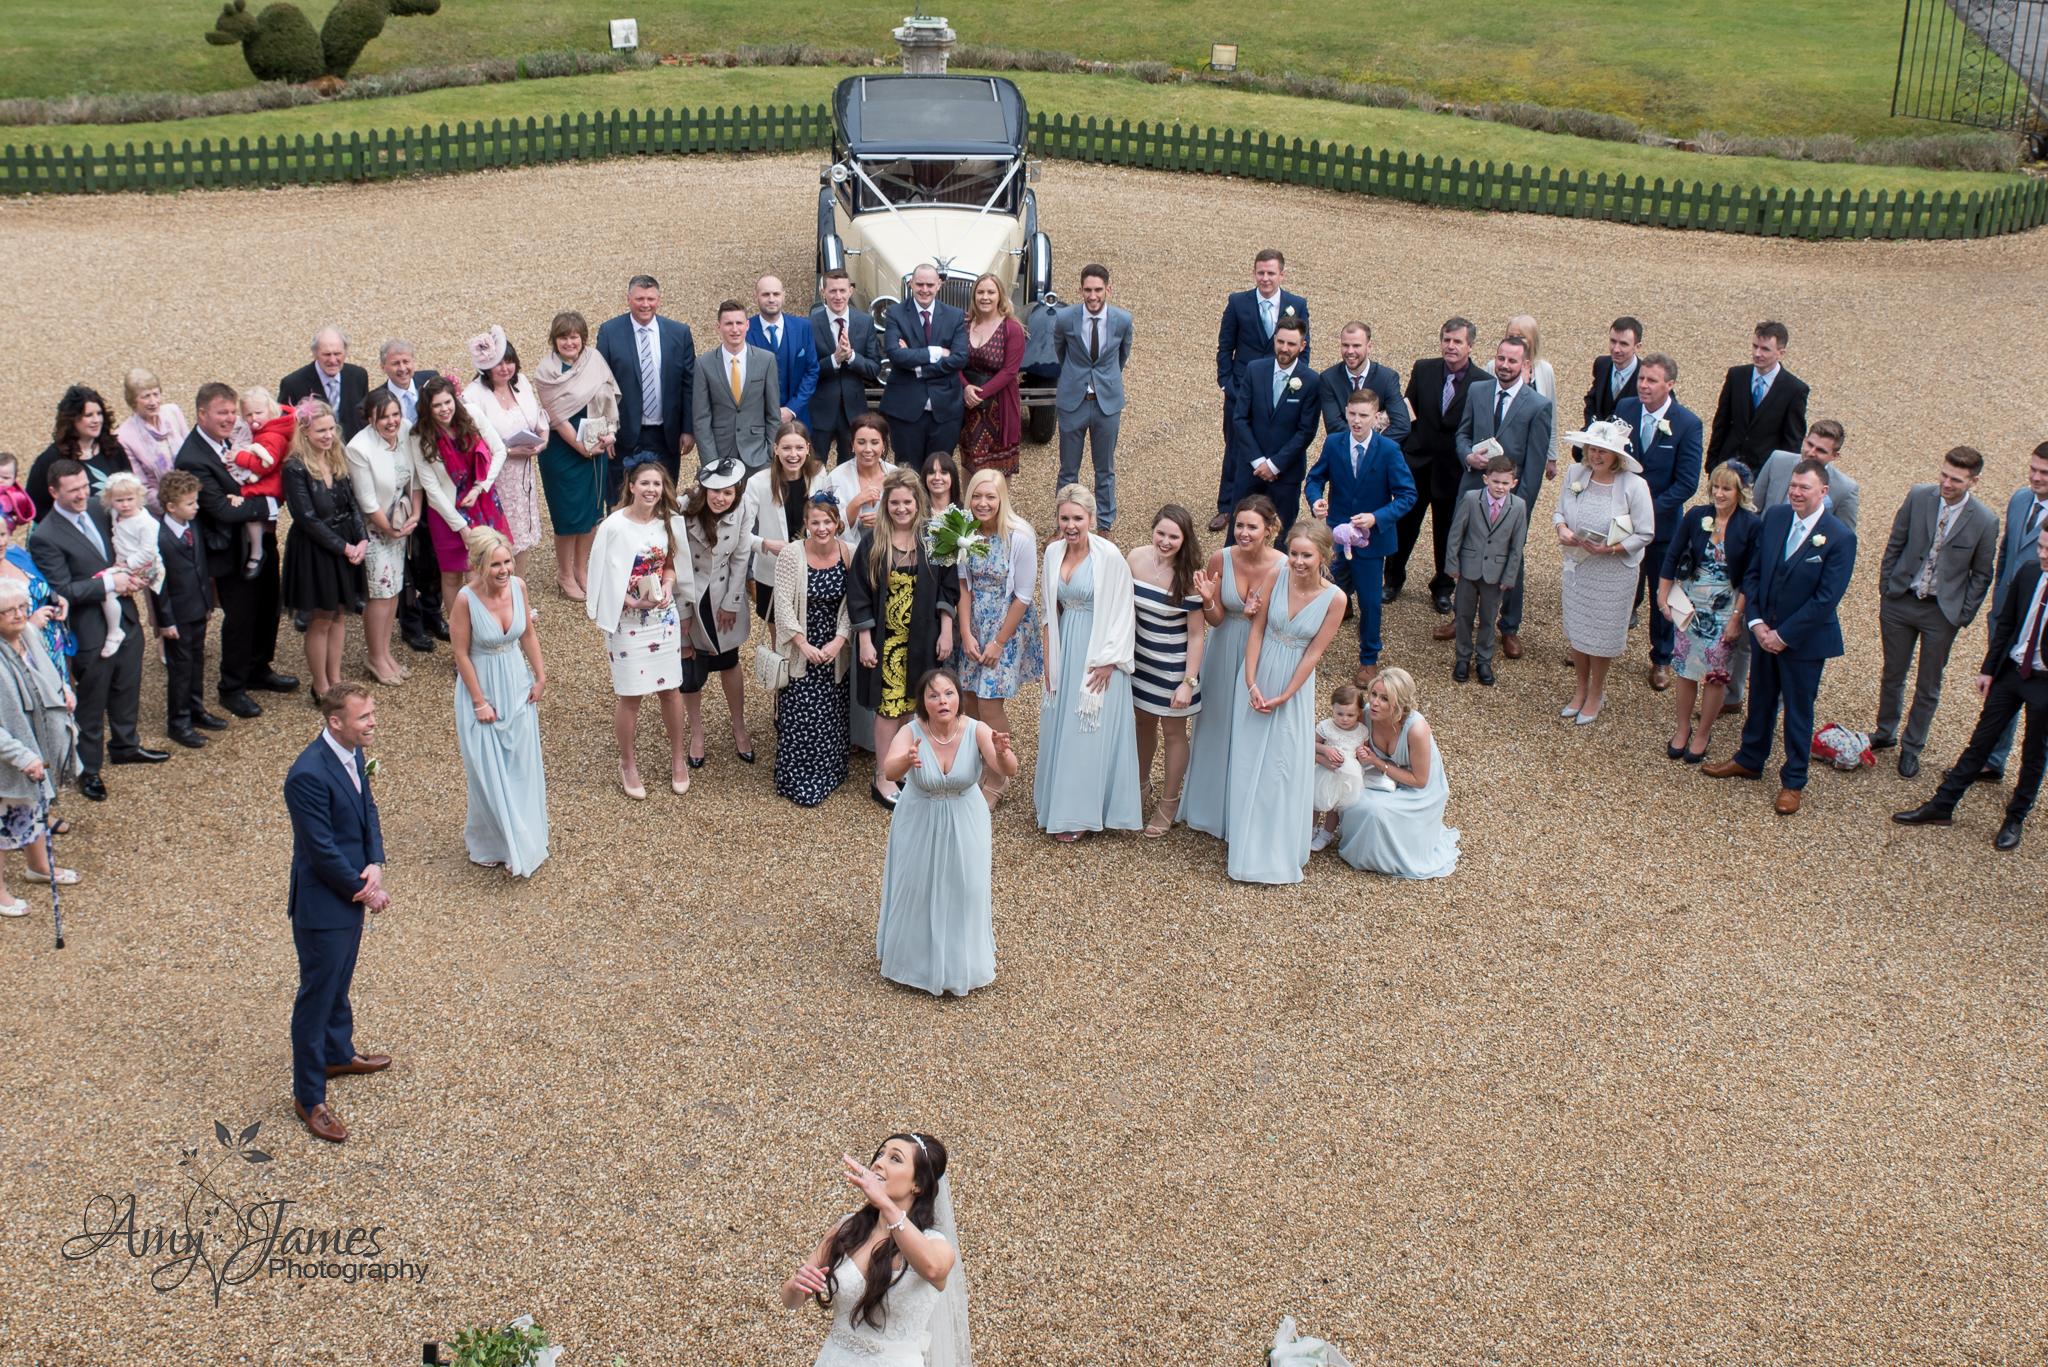 Hampshire wedding photogrpaher // Fleet wedding photographer // Warbrook house wedding Photogrpher // Aldershot garrison wedding